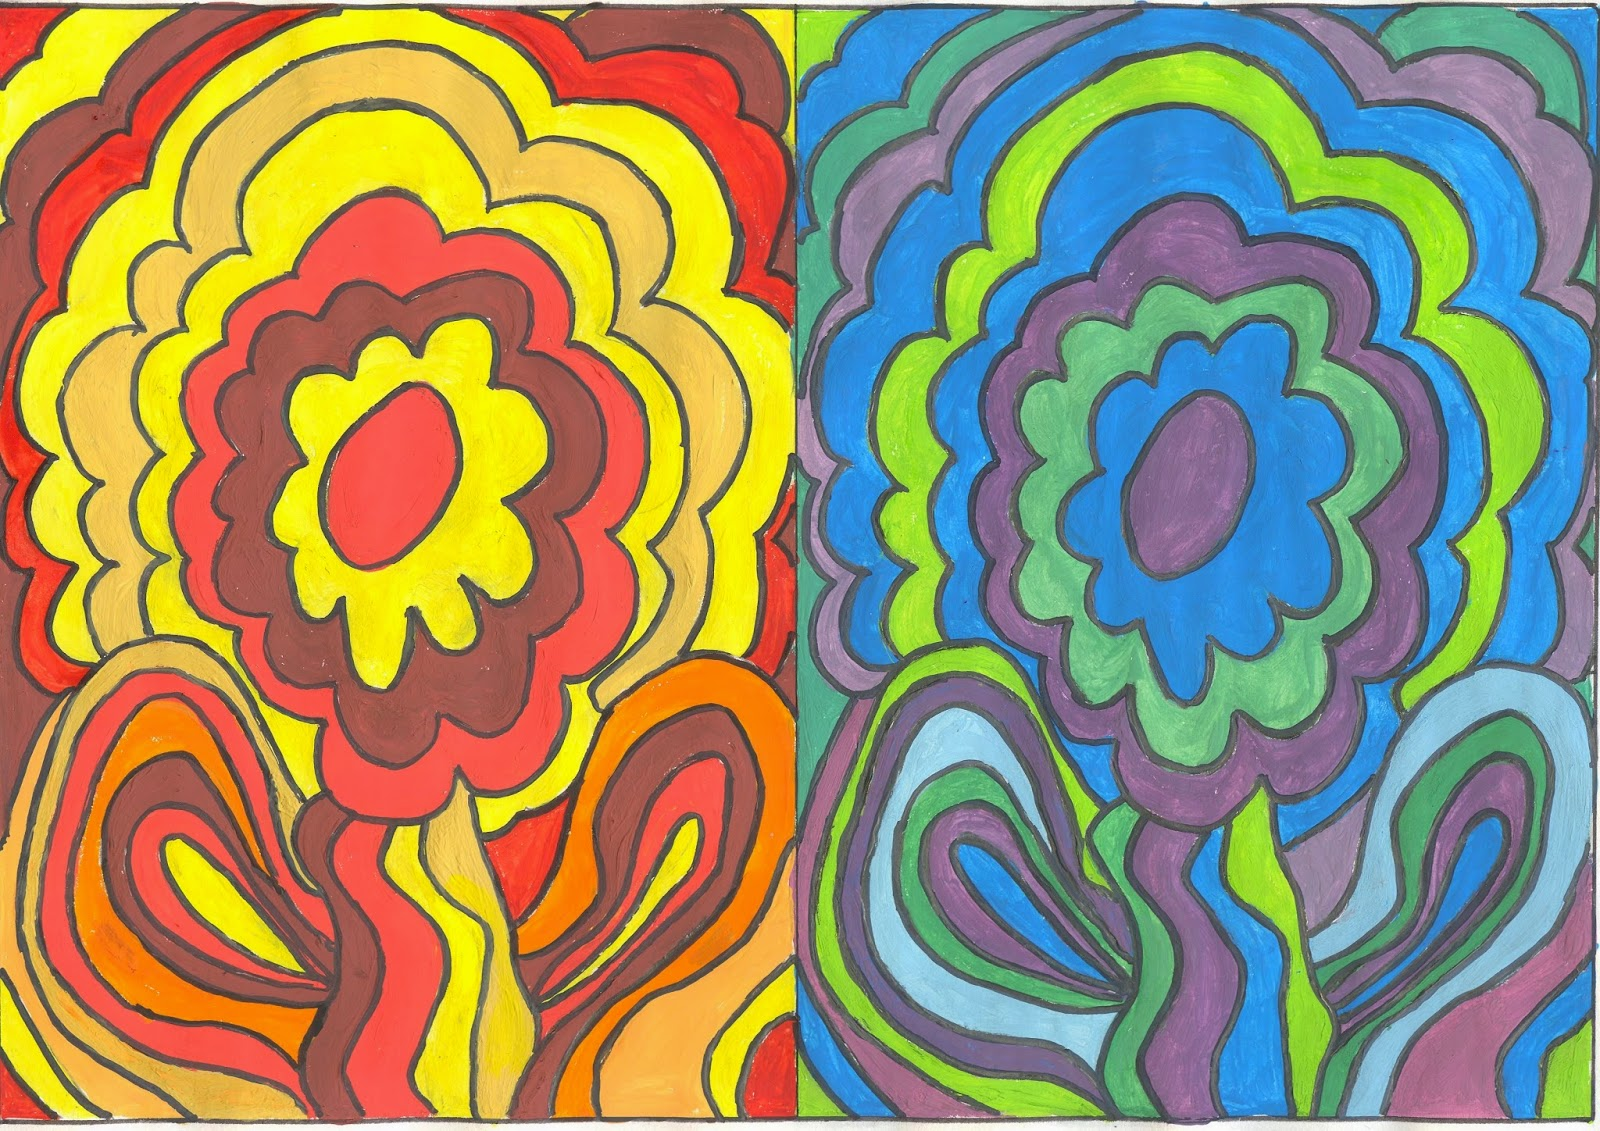 Ana nu o epv mayo 2015 - Imagenes de colores calidos ...